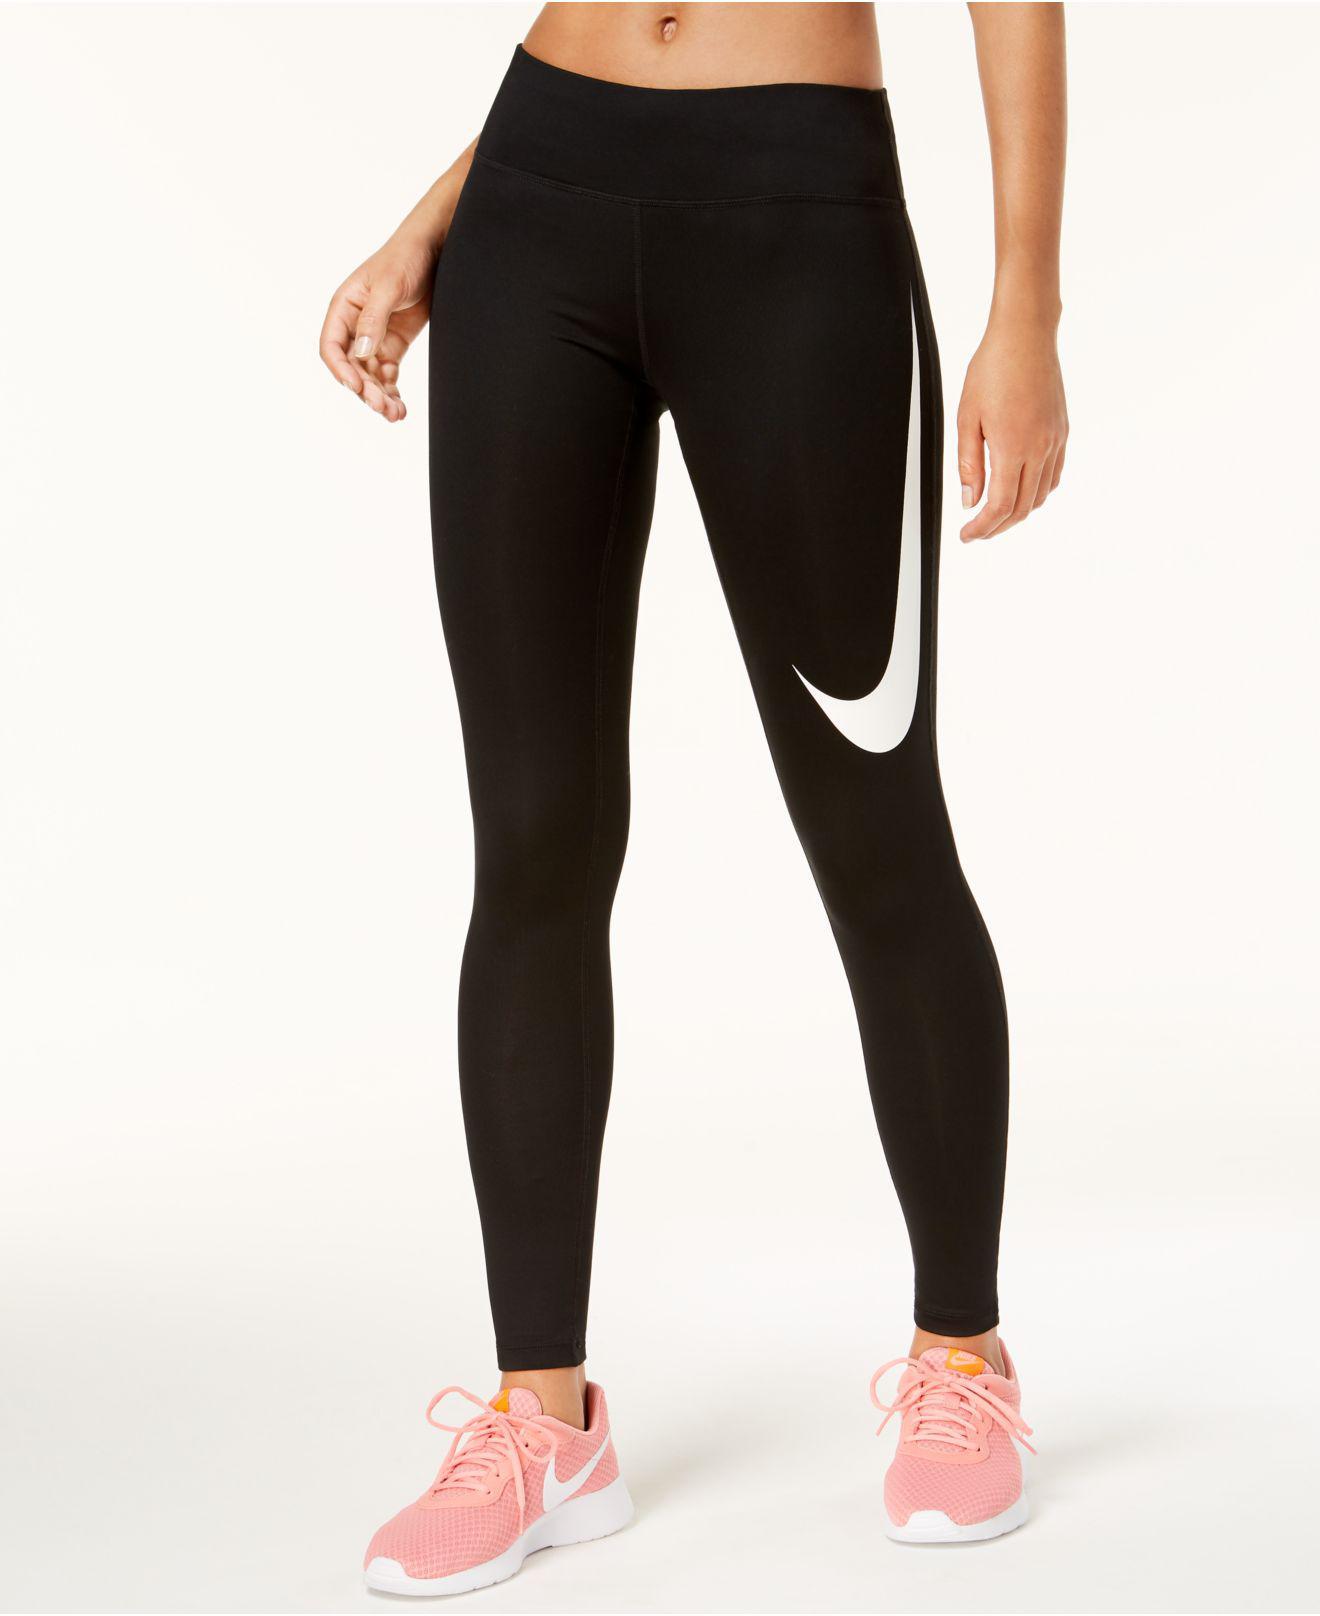 6b25338f3623 Macys Womens Nike Workout Clothes